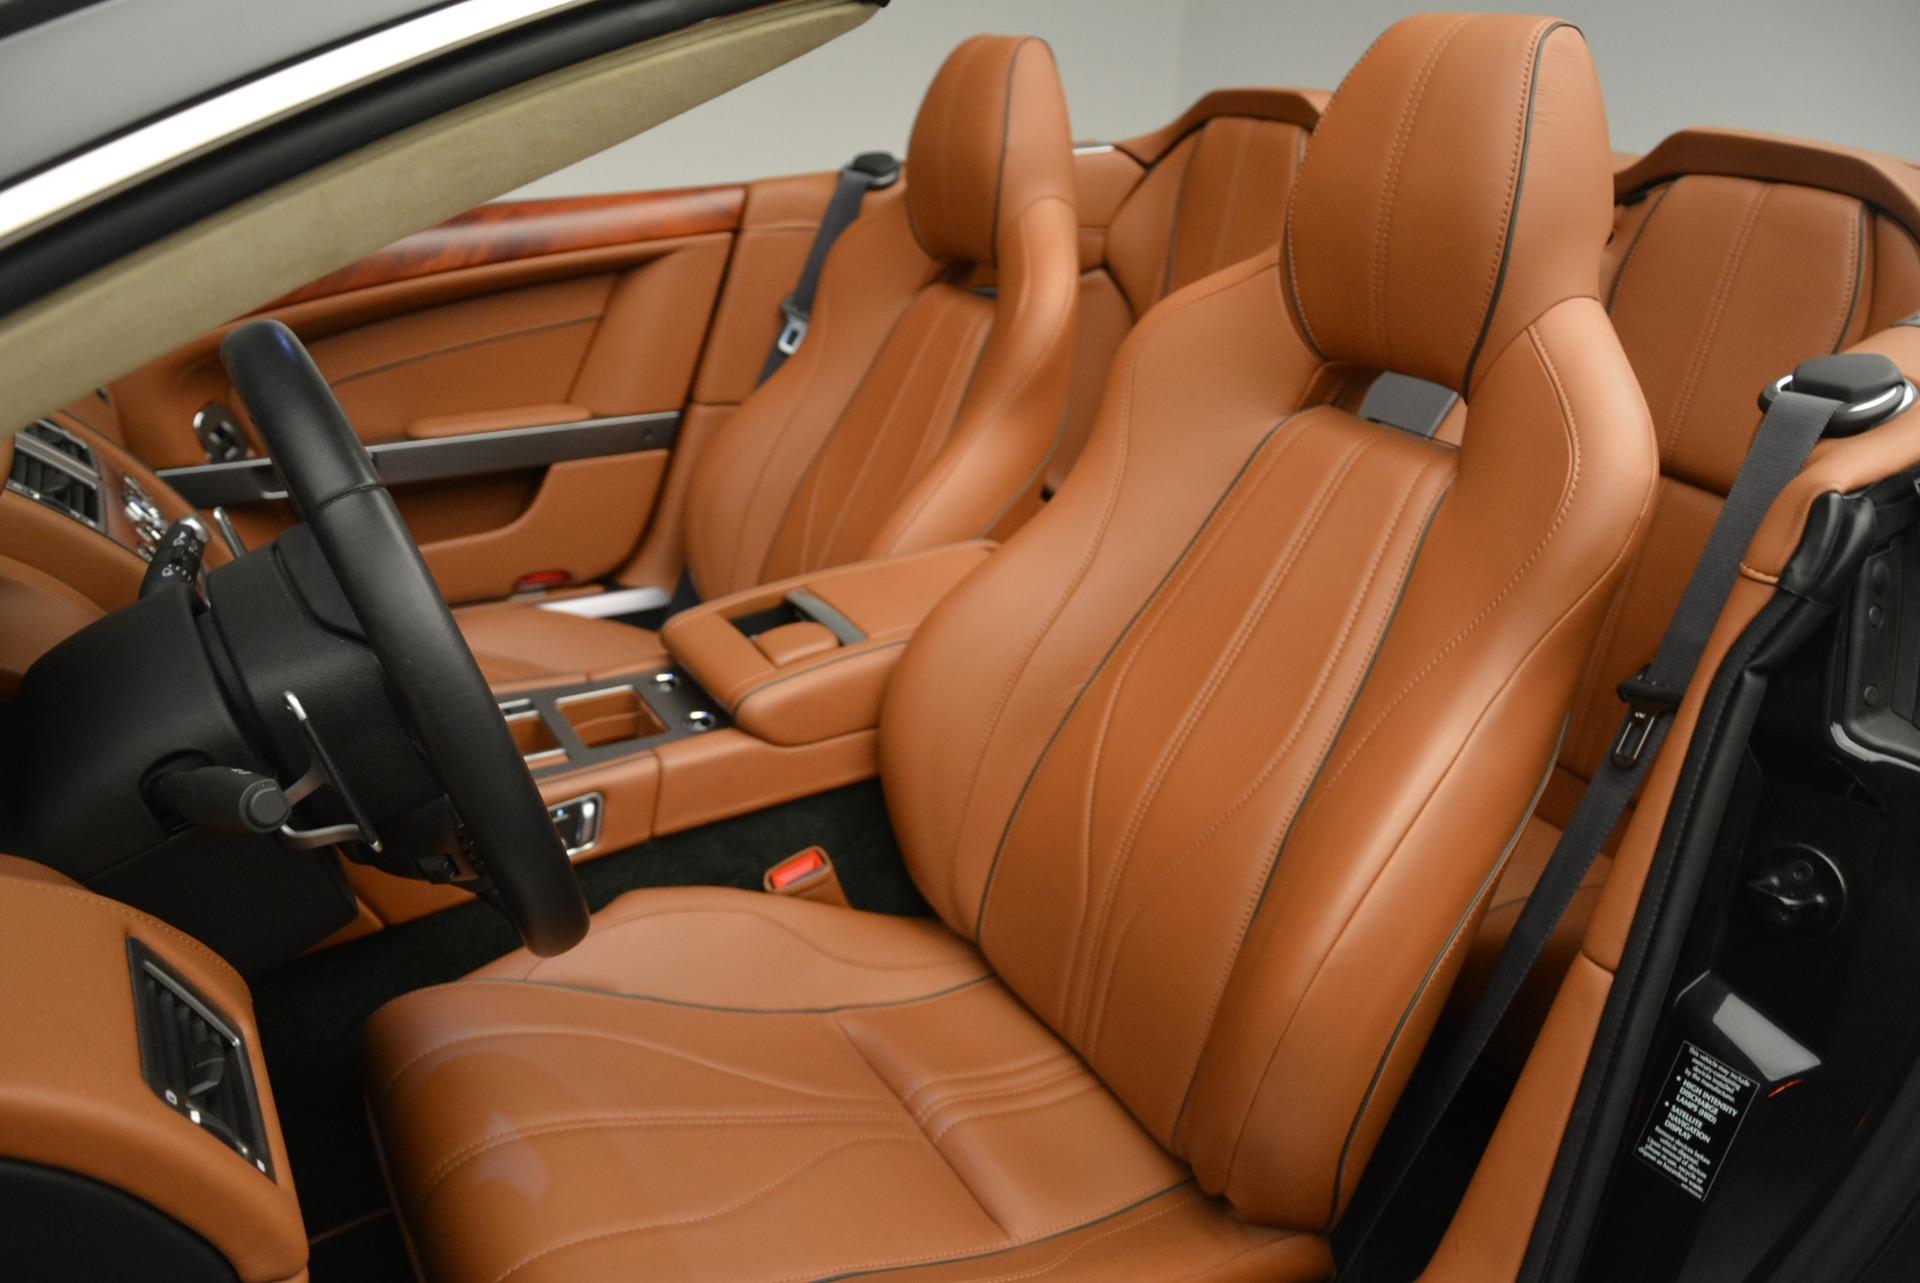 Used 2012 Aston Martin Virage Volante For Sale In Westport, CT 2508_p21